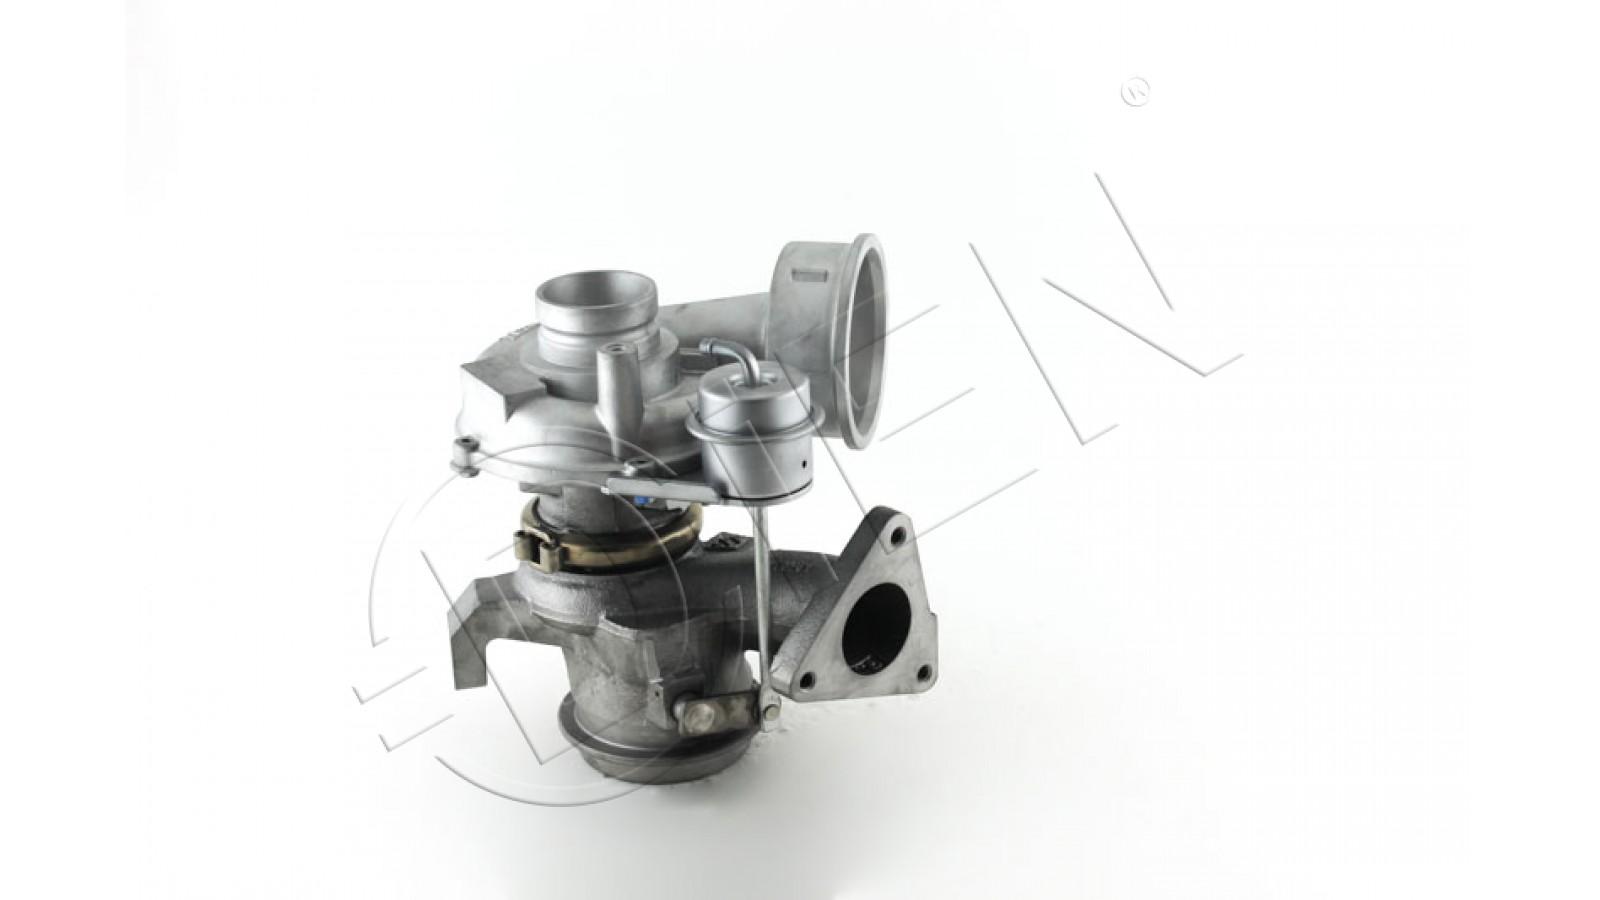 turbina mercedes a-klasse 160 cdi  w169  82 cv